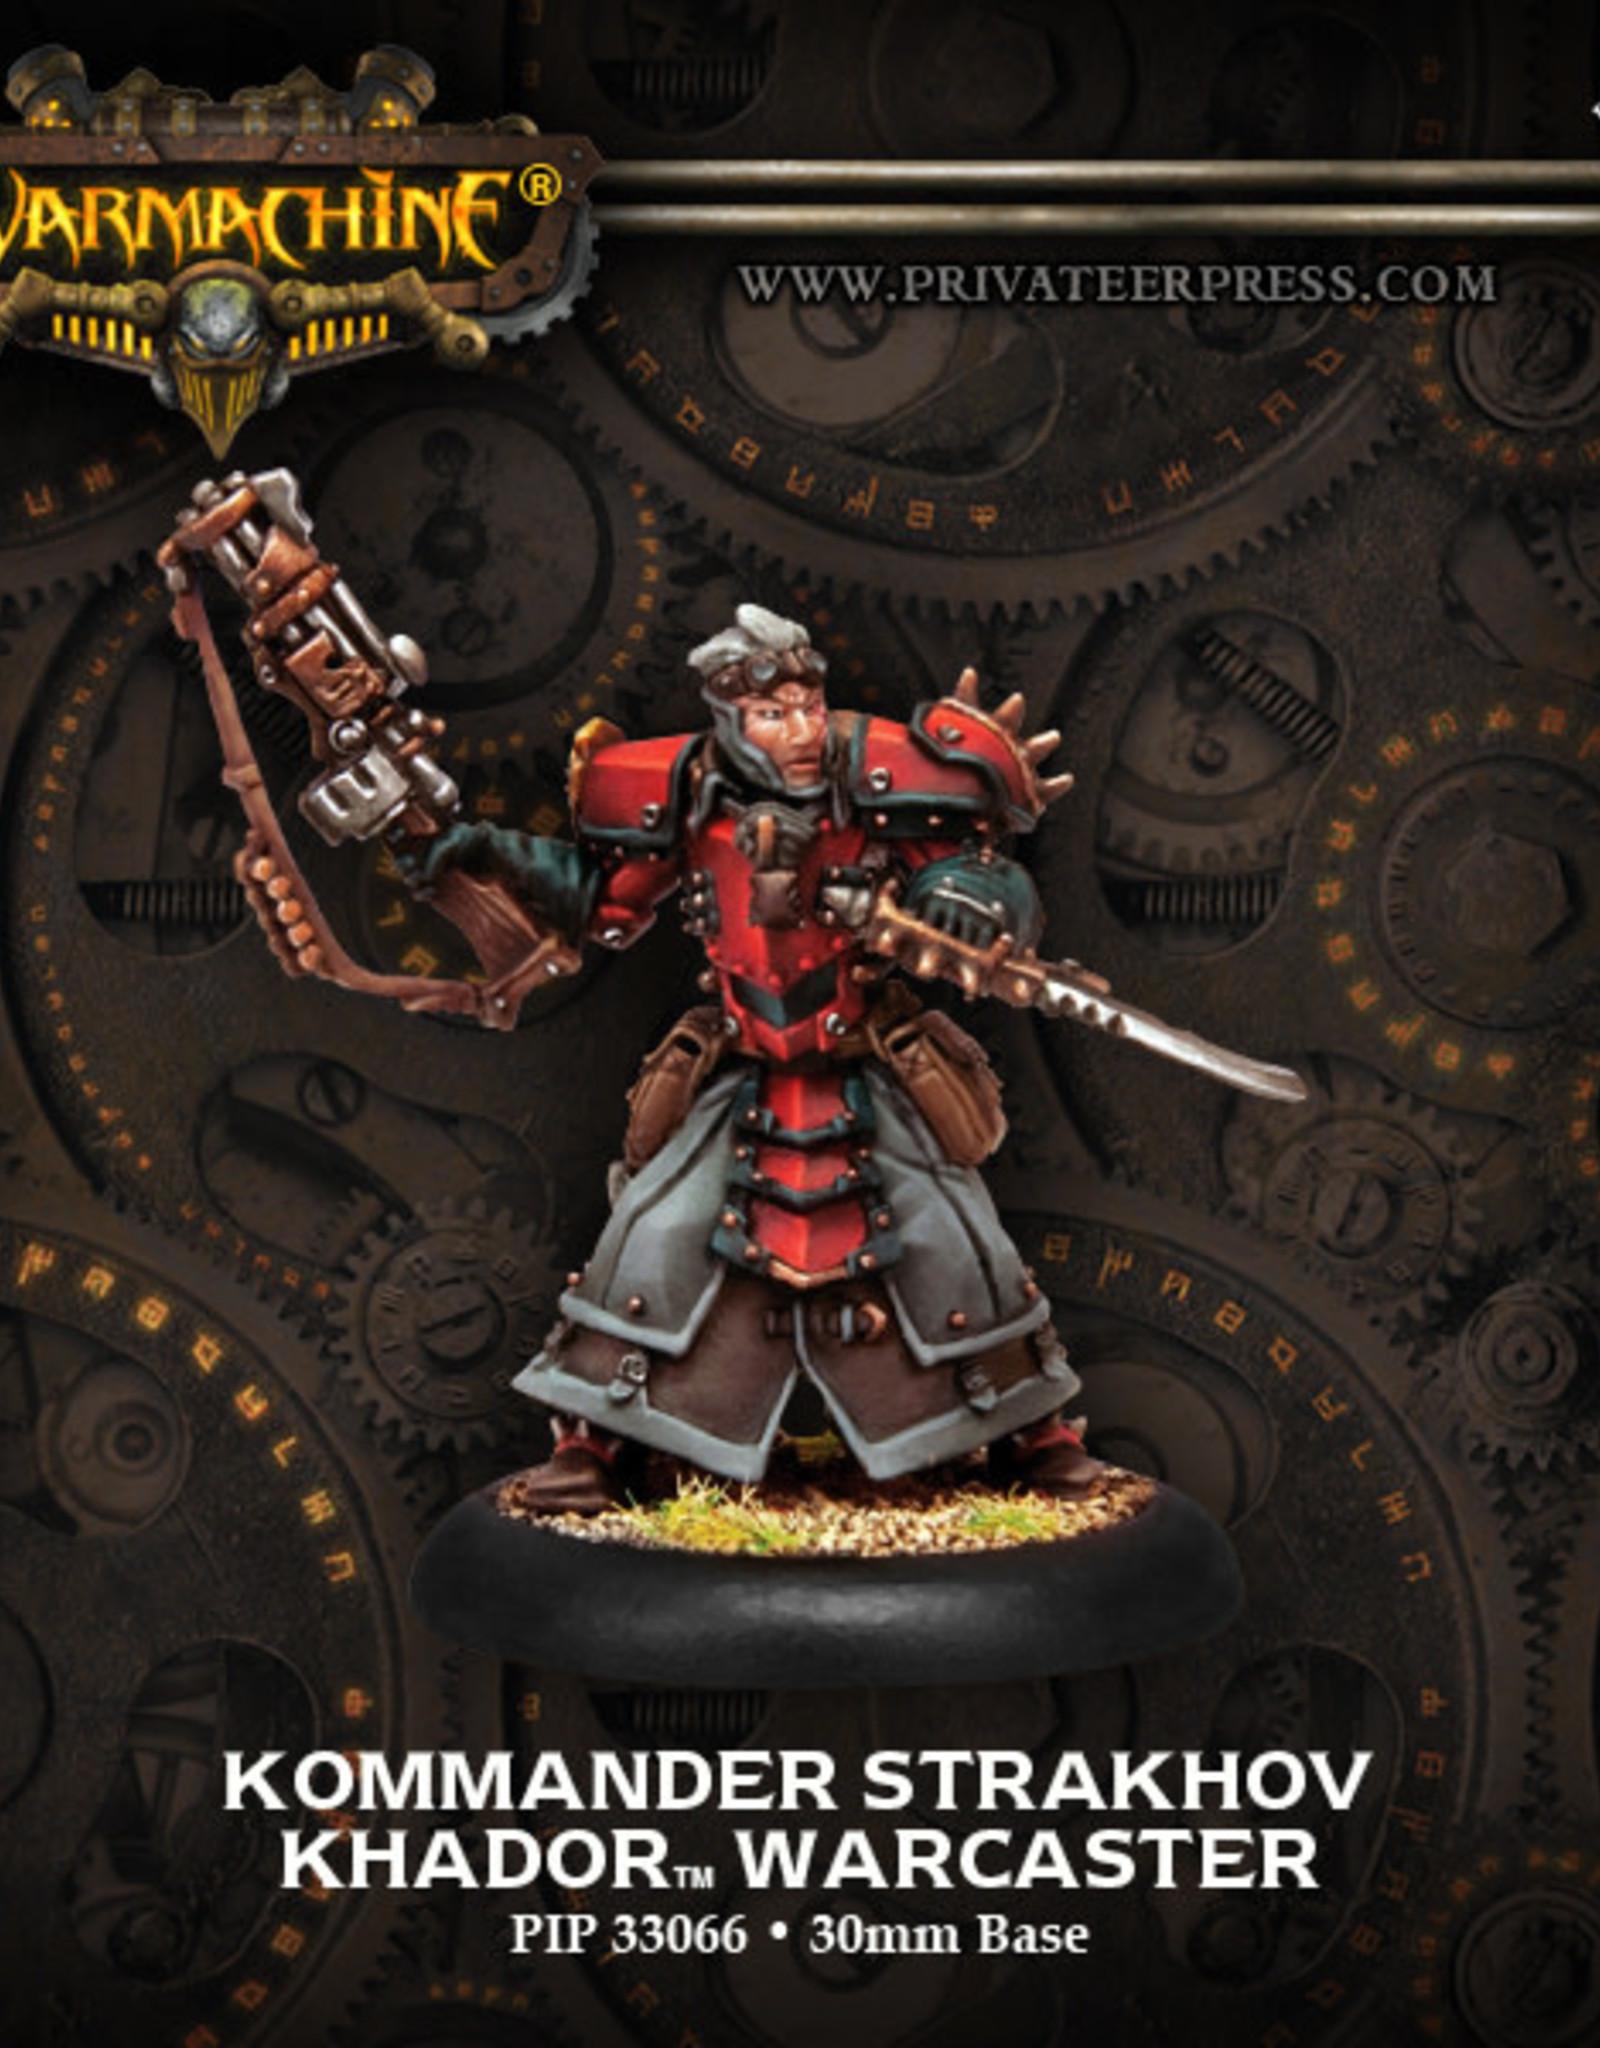 Warmachine Khador Kommander Strakhov